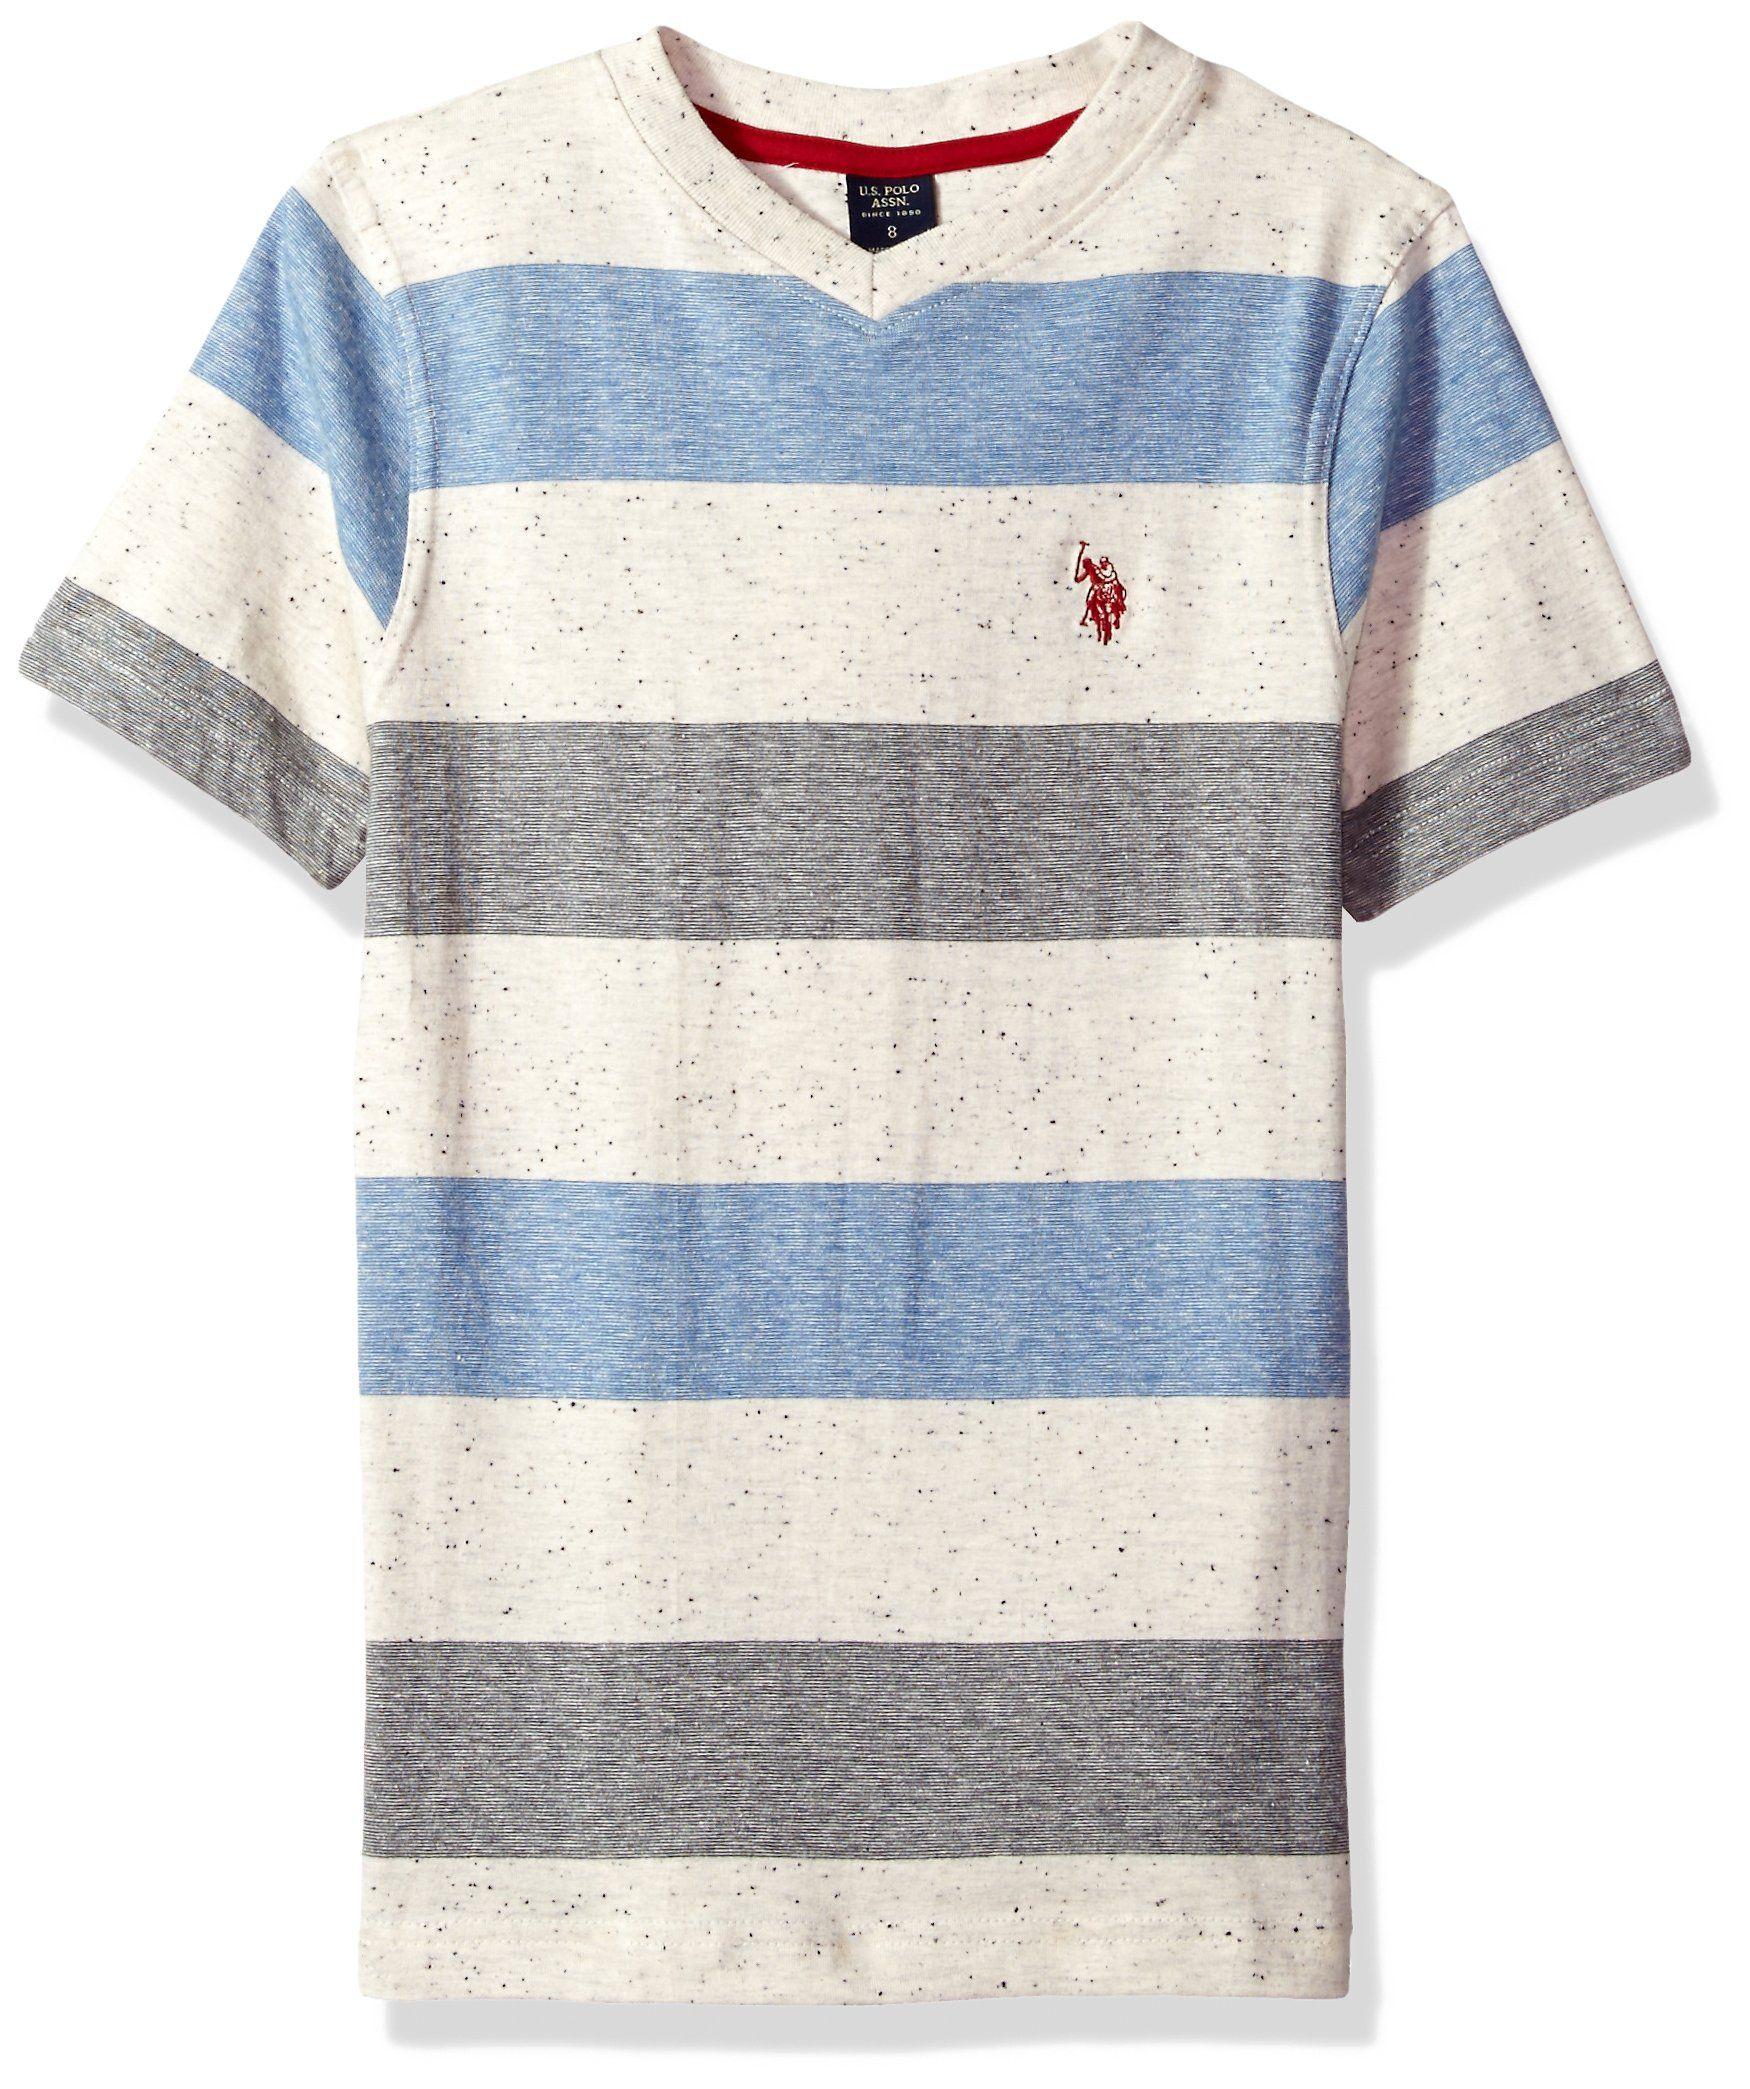 U.S Polo Assn Boys Short Sleeve Striped Crew Neck T-Shirt